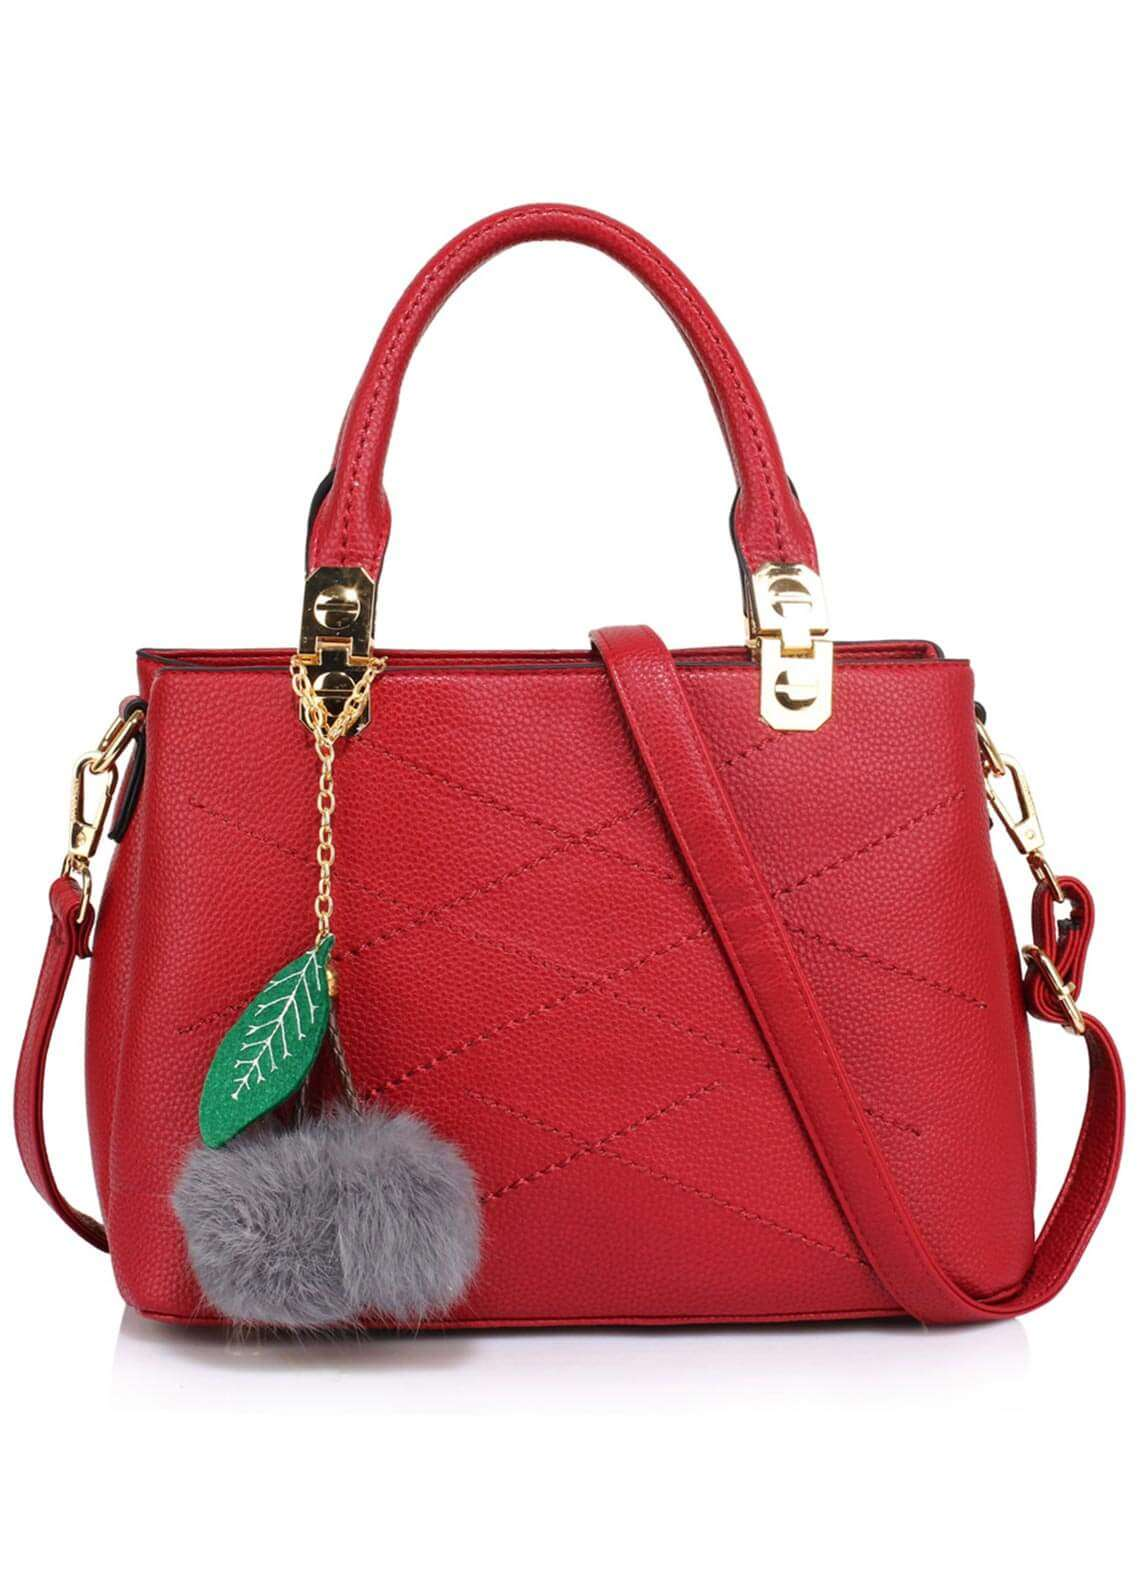 Anna Grace London Faux Leather Shoulder  Bags for Woman - Burgundy